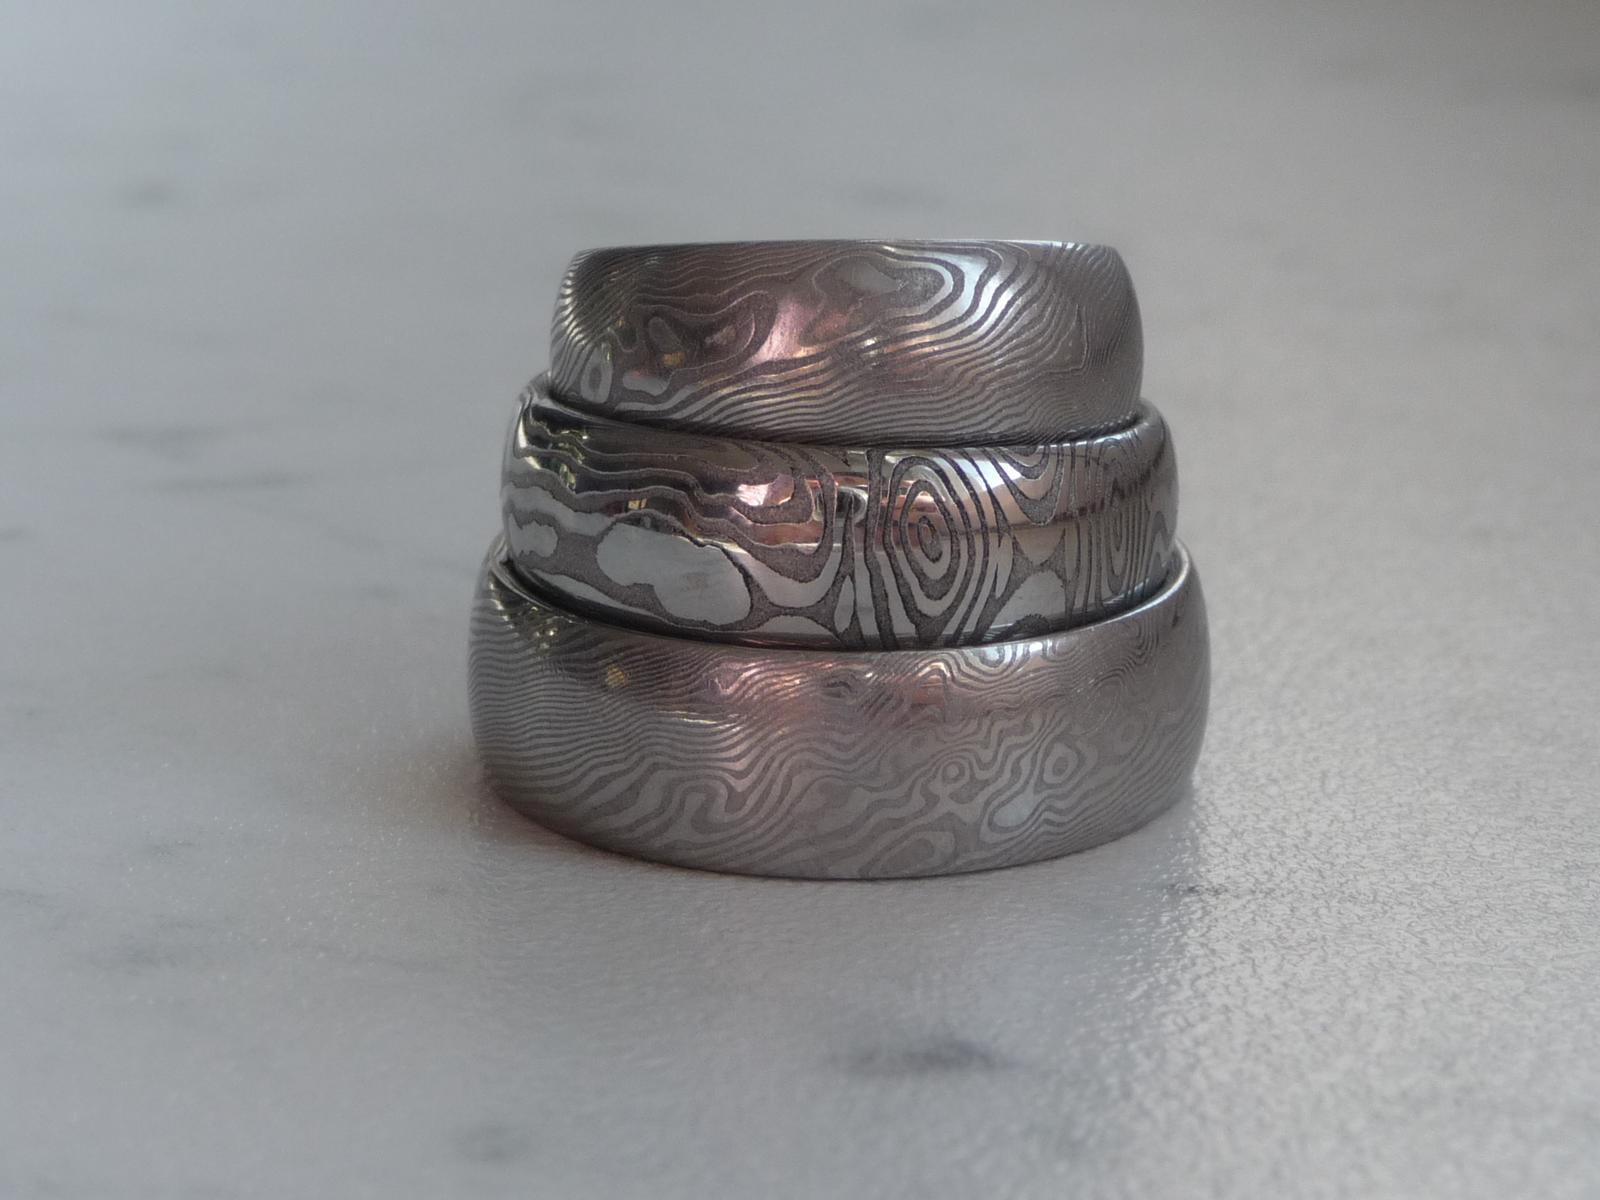 Mate Zkusenost Se Snubnimi Prsteny Z Damaskove Oce